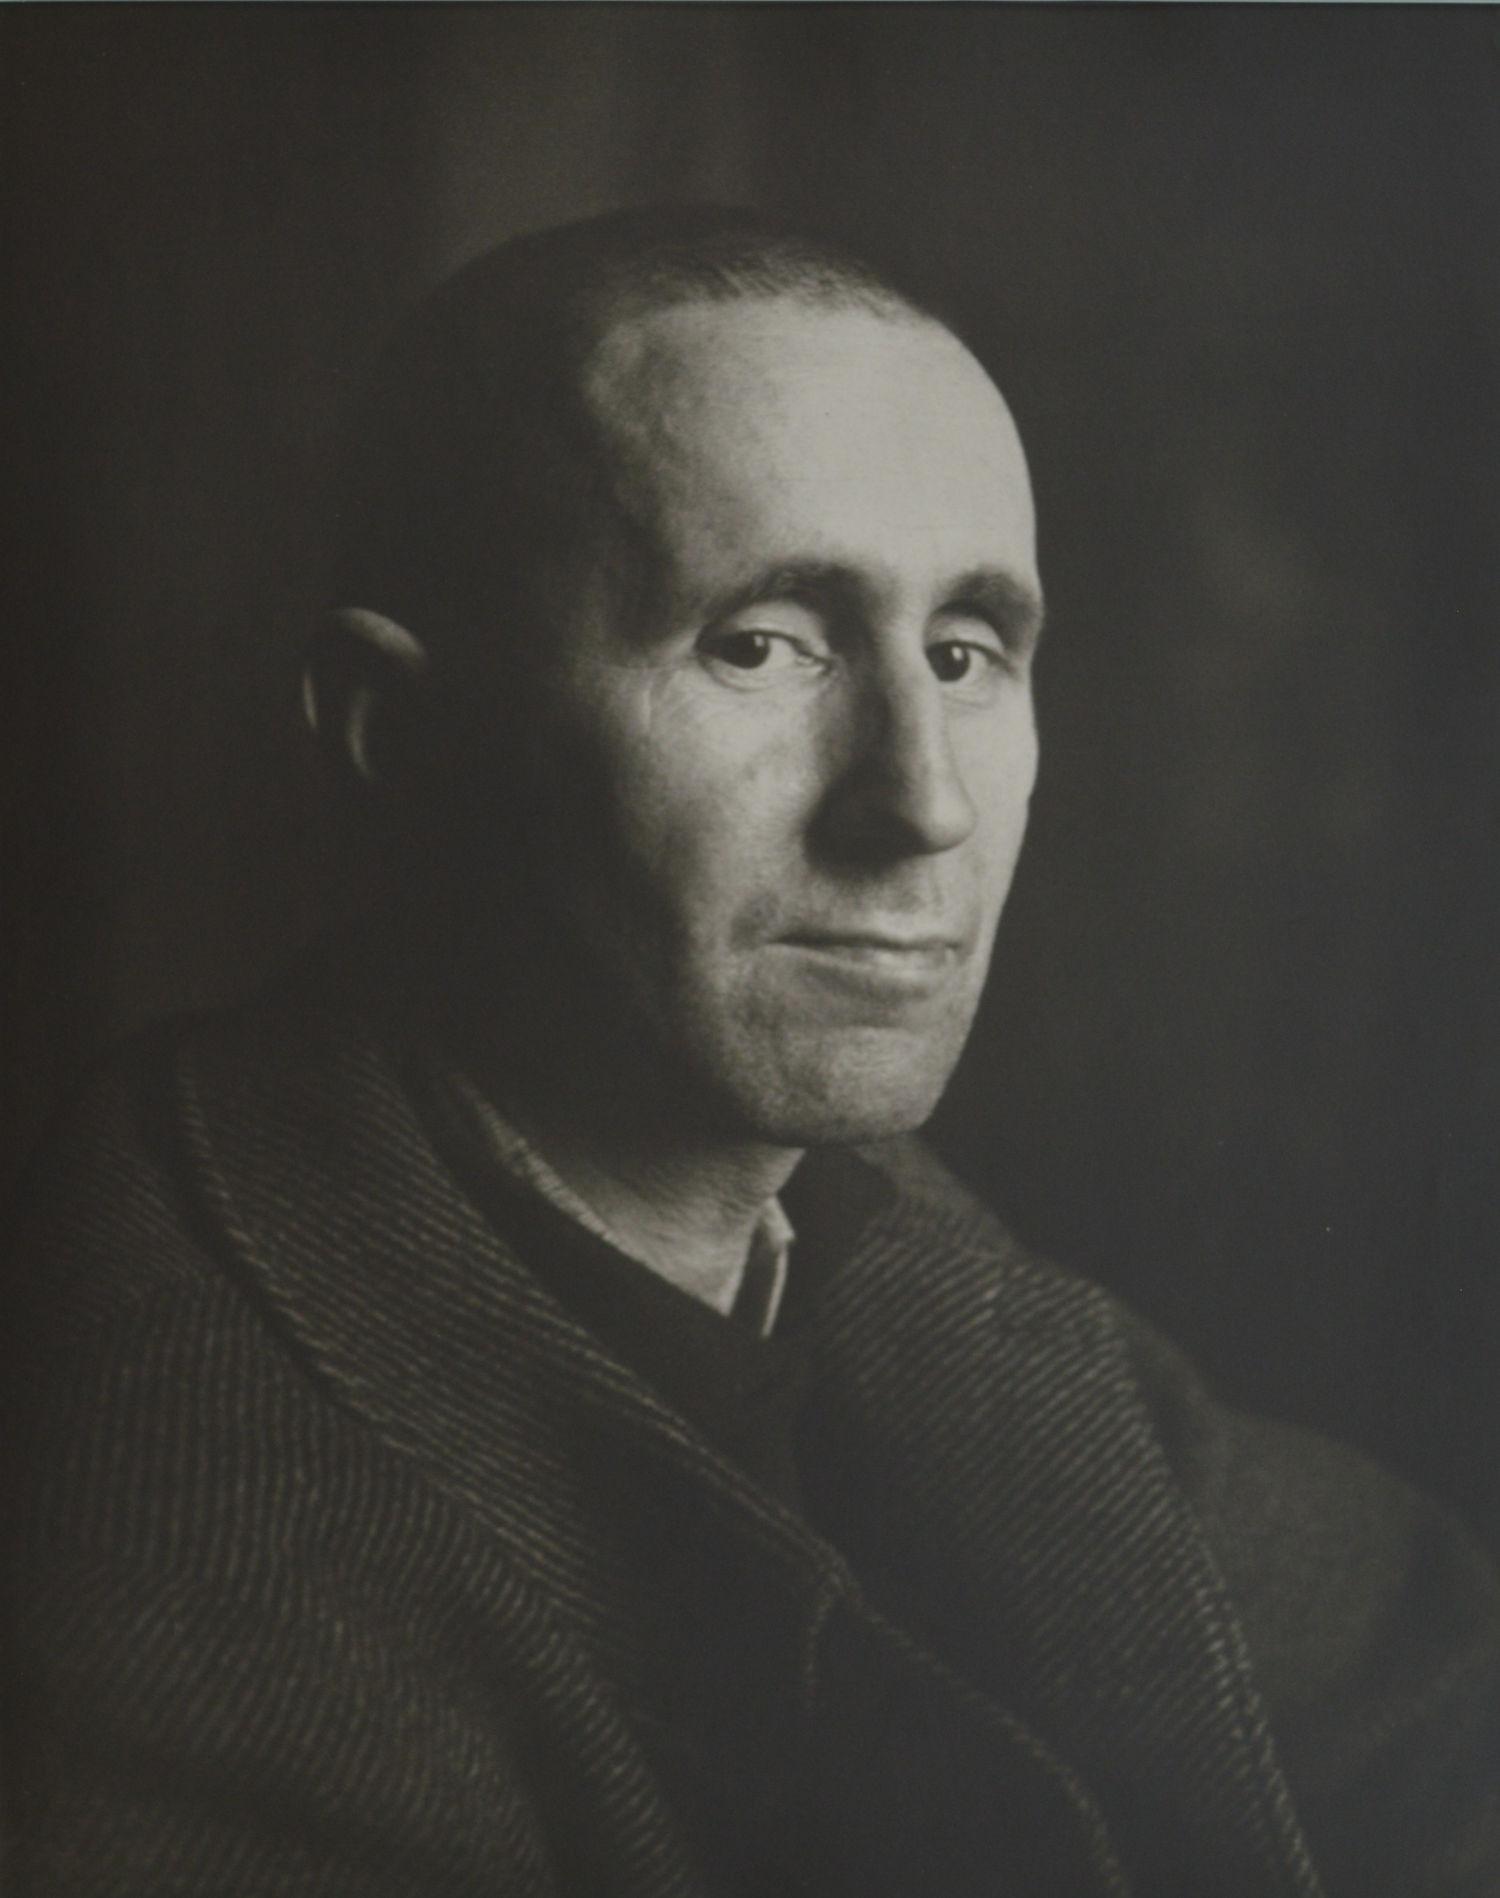 Breitenbach - Berthold Brecht.jpg